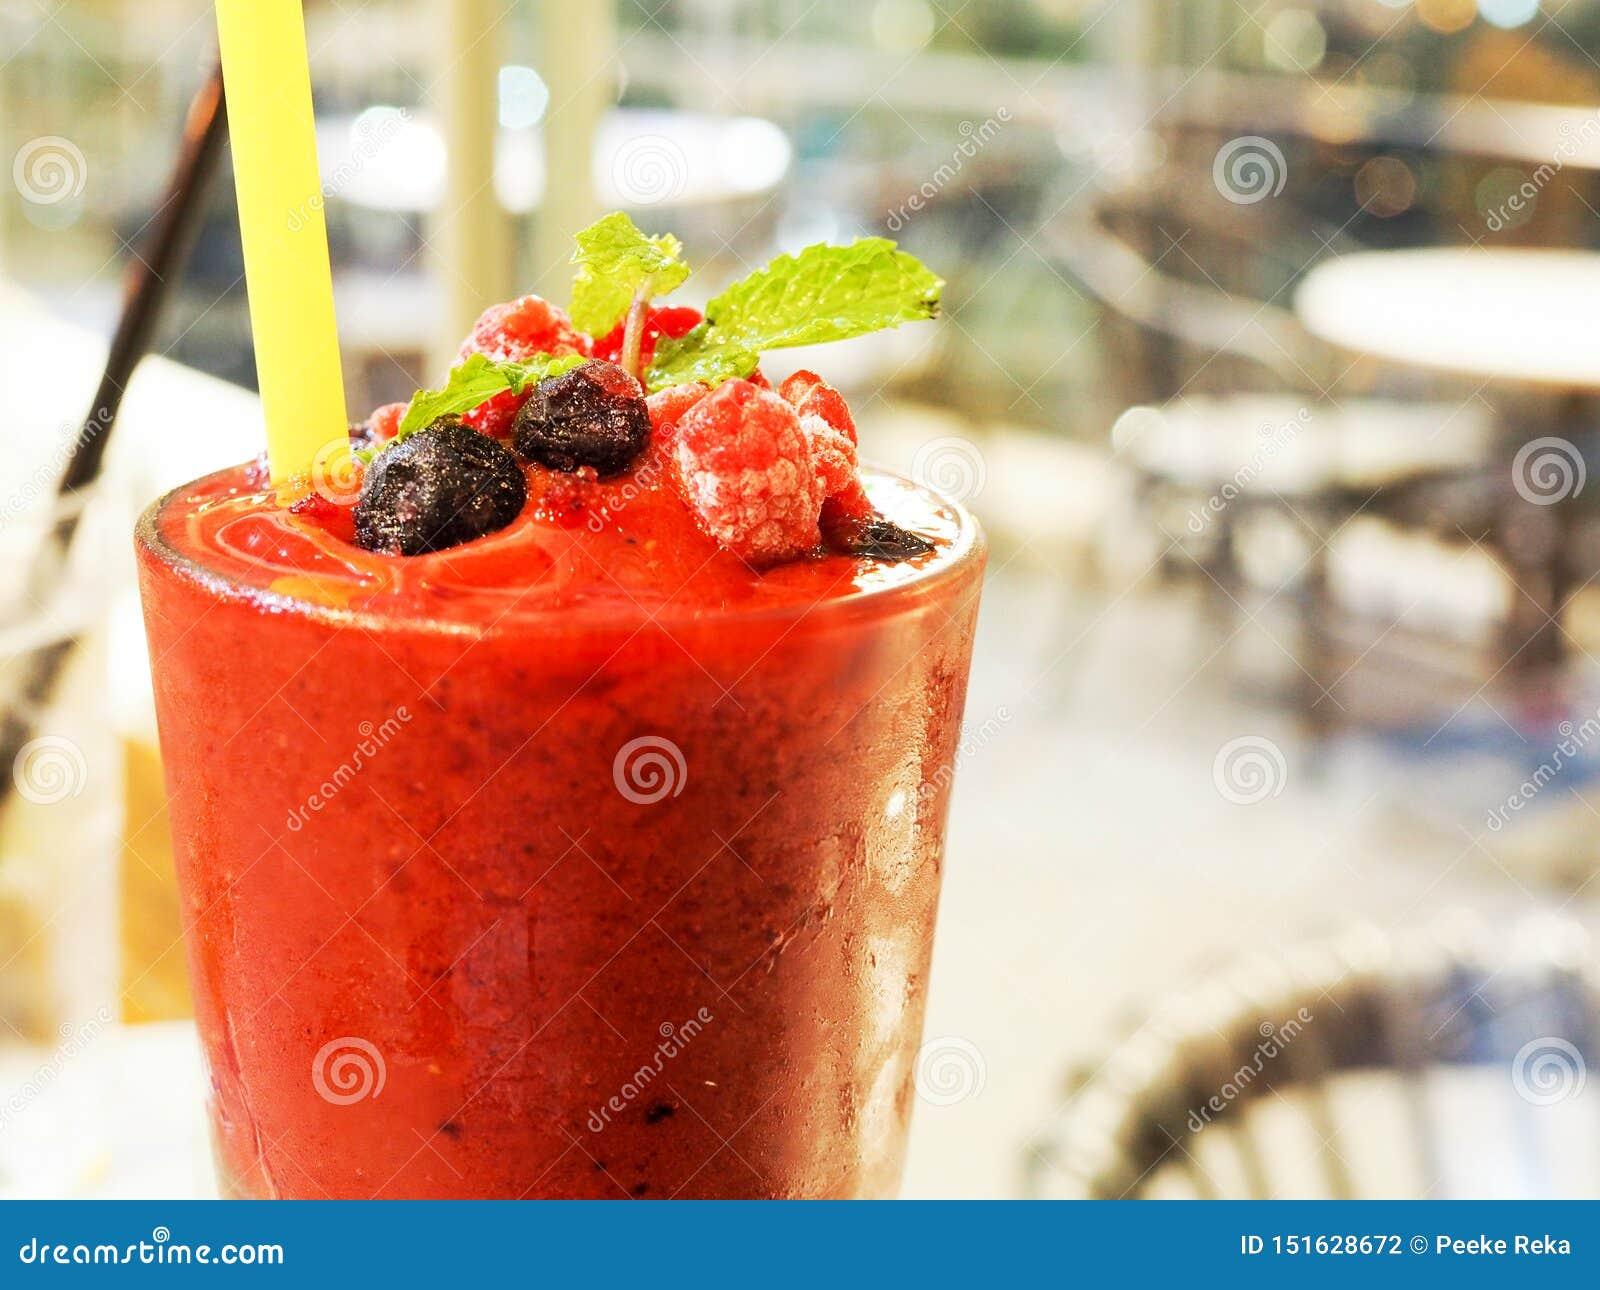 夏天thirst-quenching饮料用红草莓汁